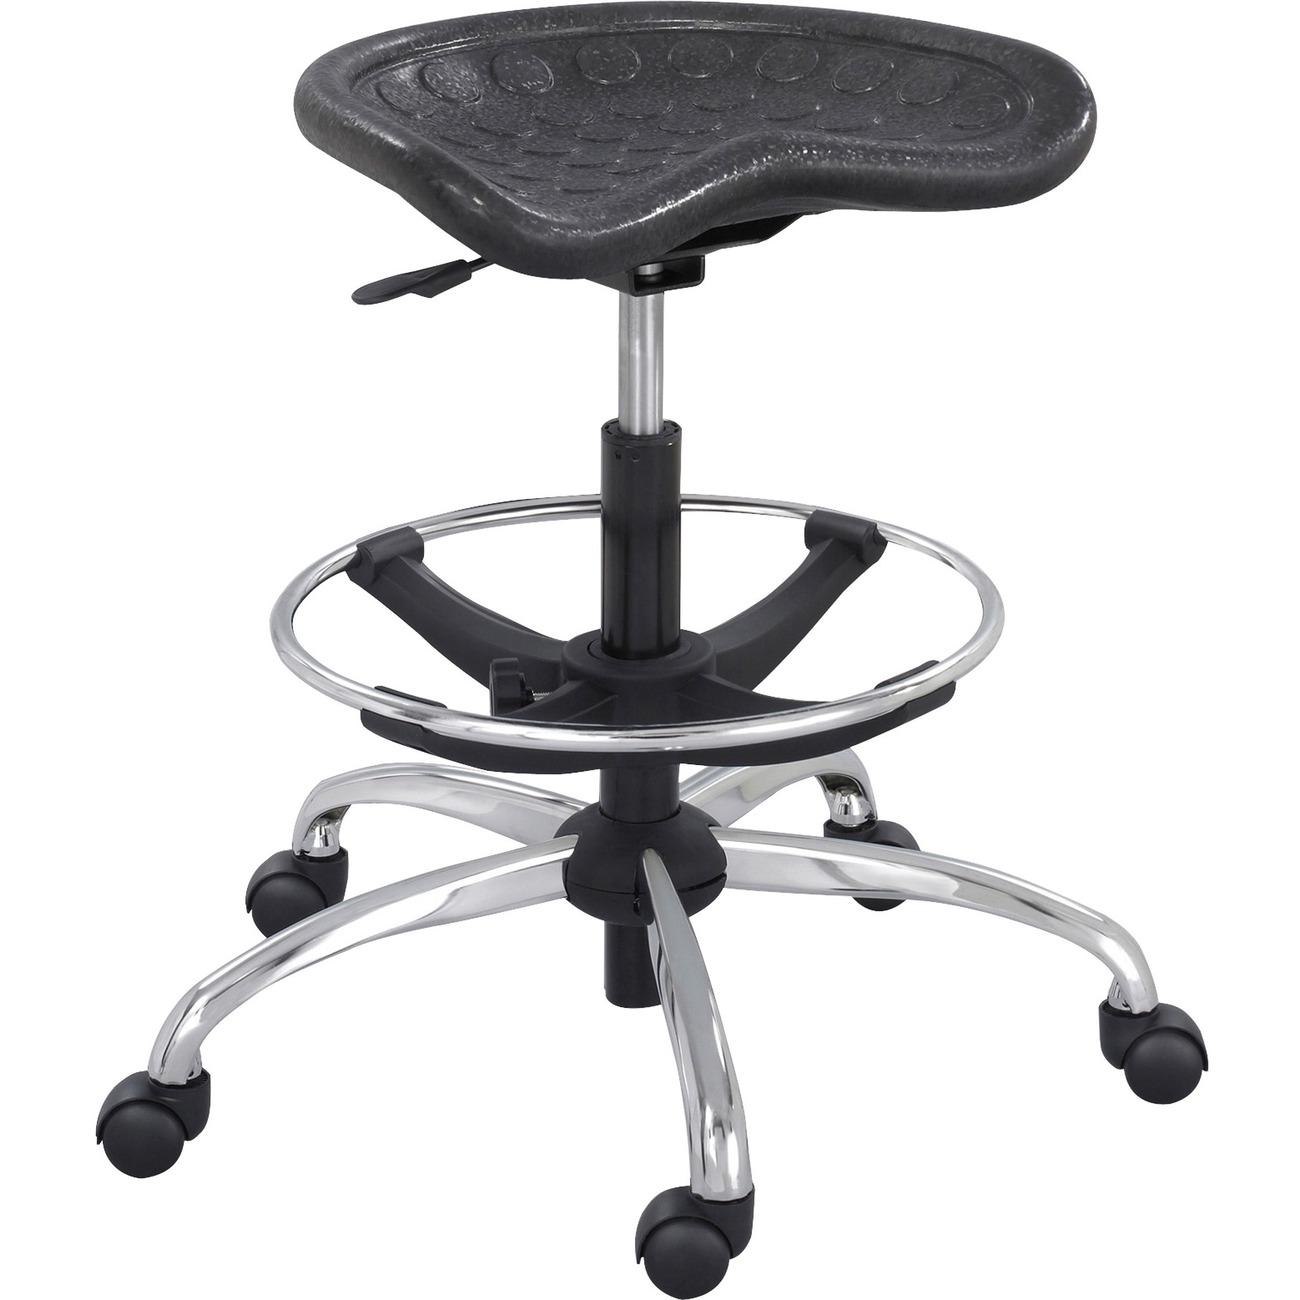 product safbl safco sitstar height adjustable stool  - loading zoom